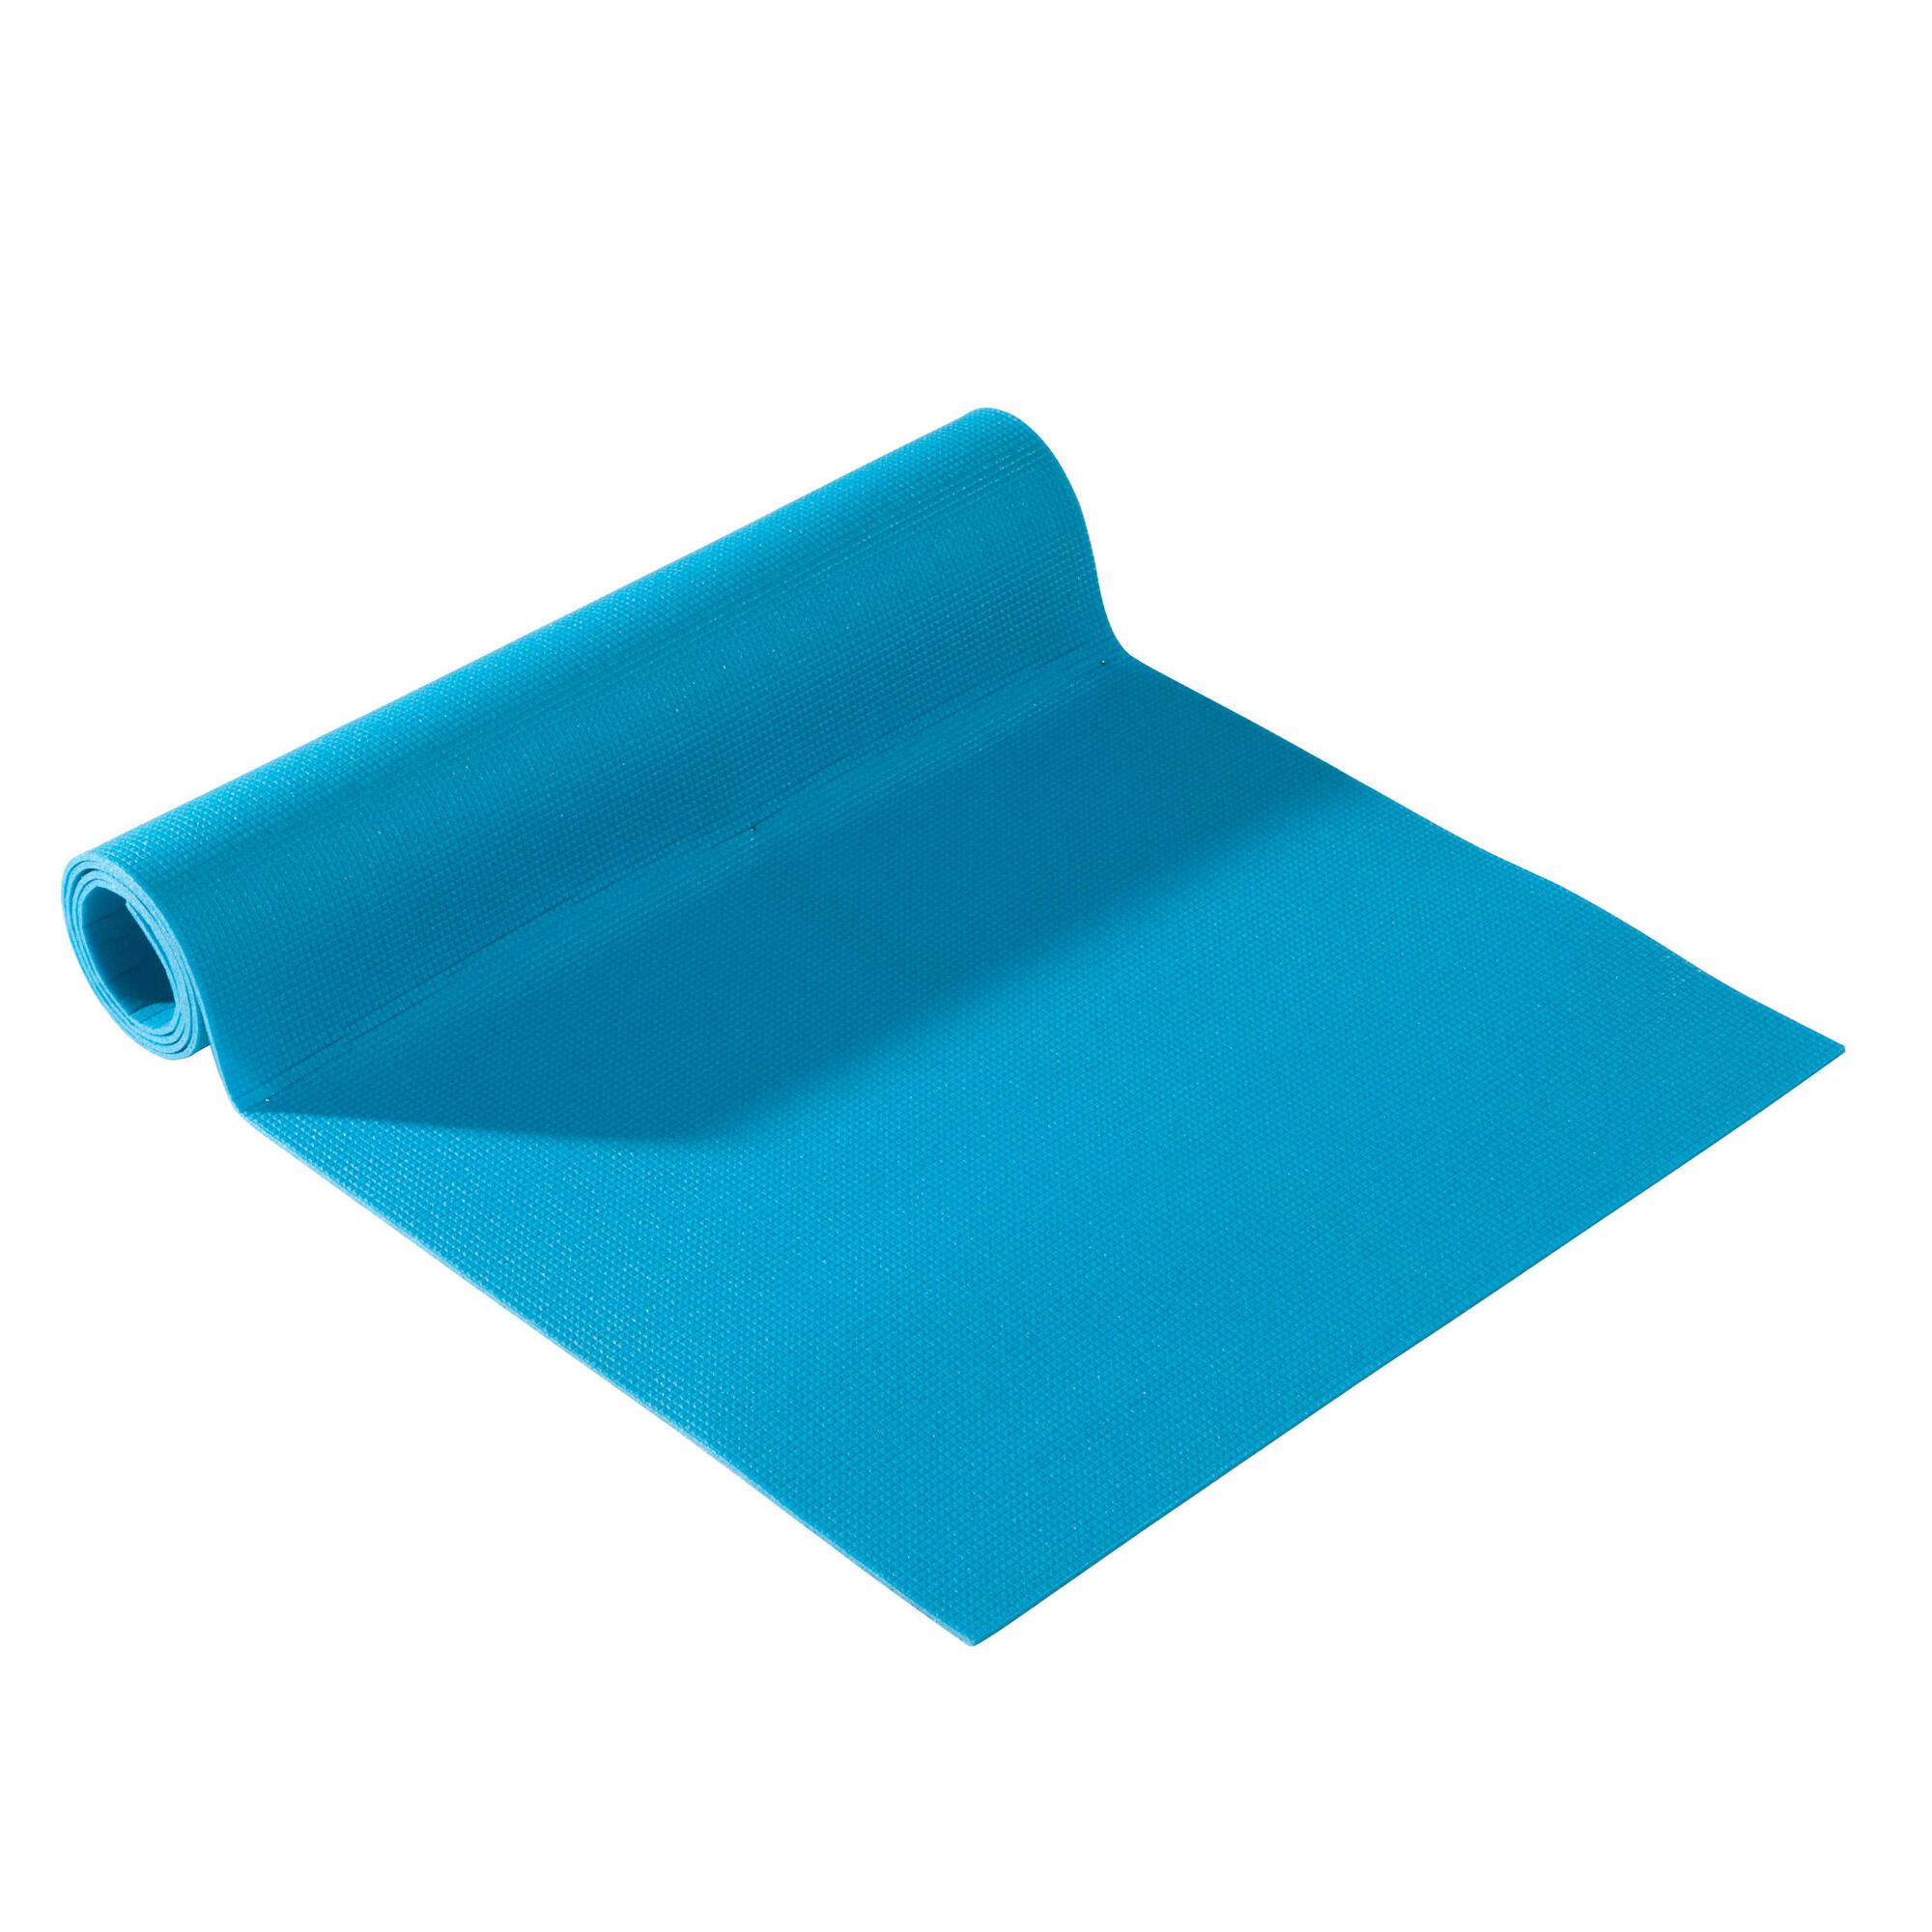 Tapis Yoga Doux Essentiel 4 Mm Bleu Domyos By Decathlon